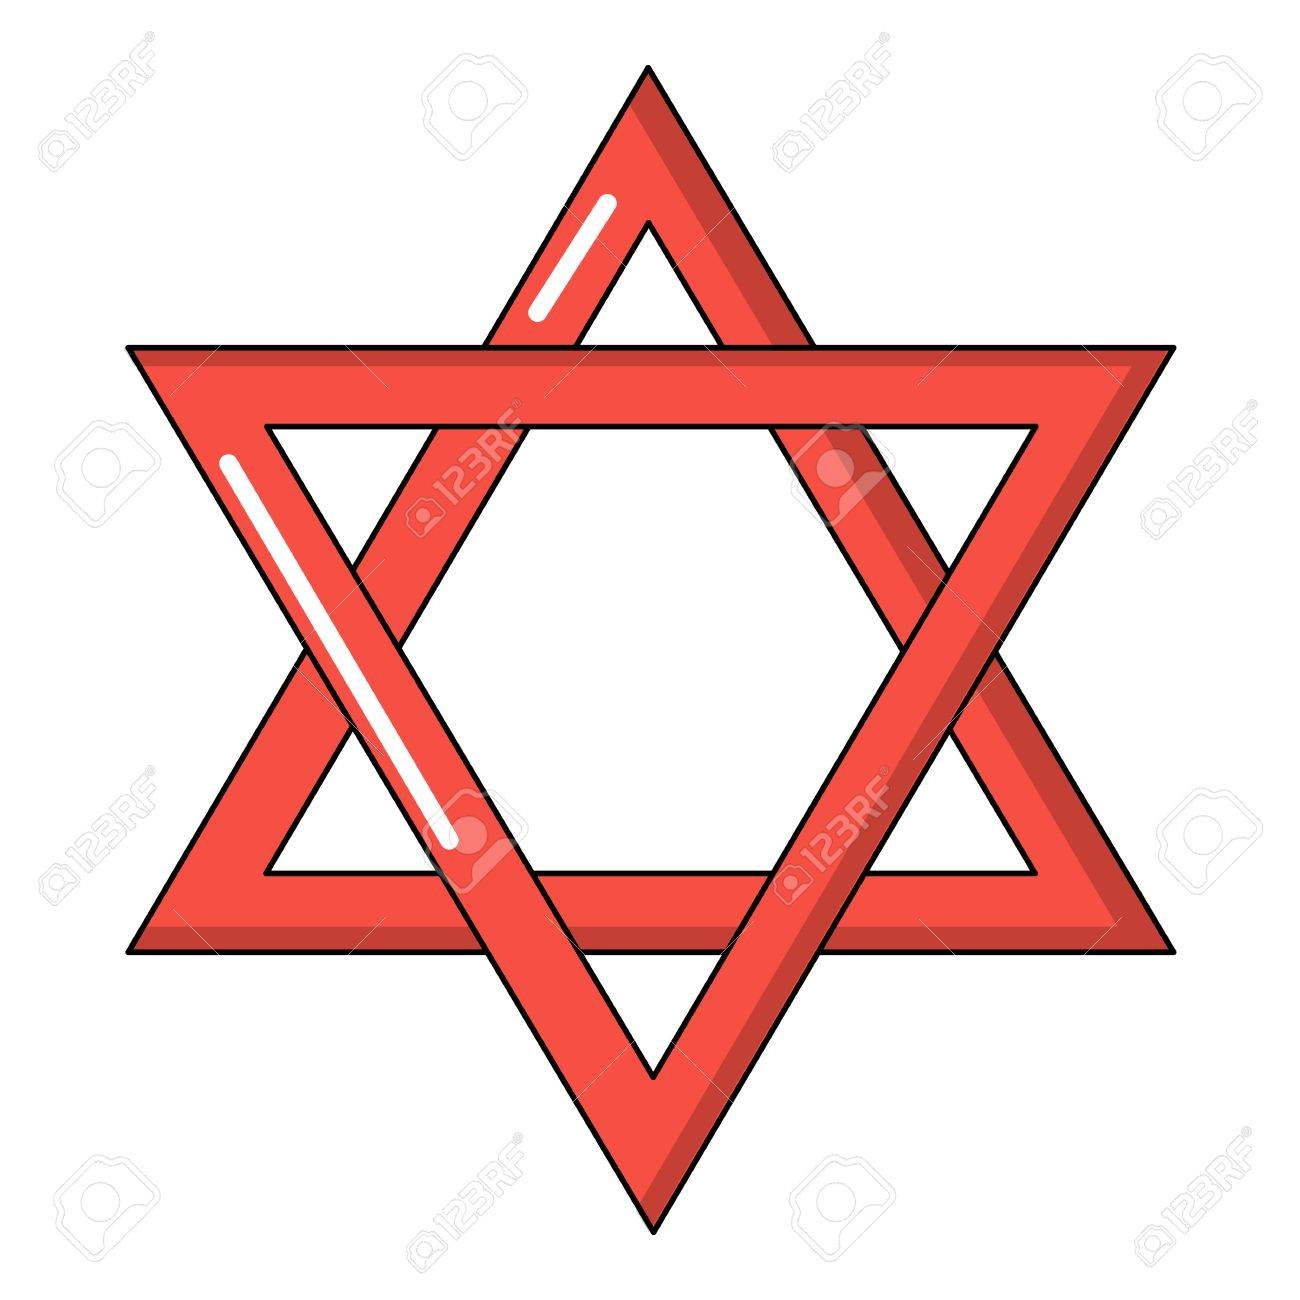 star of david judaism icon cartoon style royalty free cliparts rh 123rf com star of david vector free star of david vector image